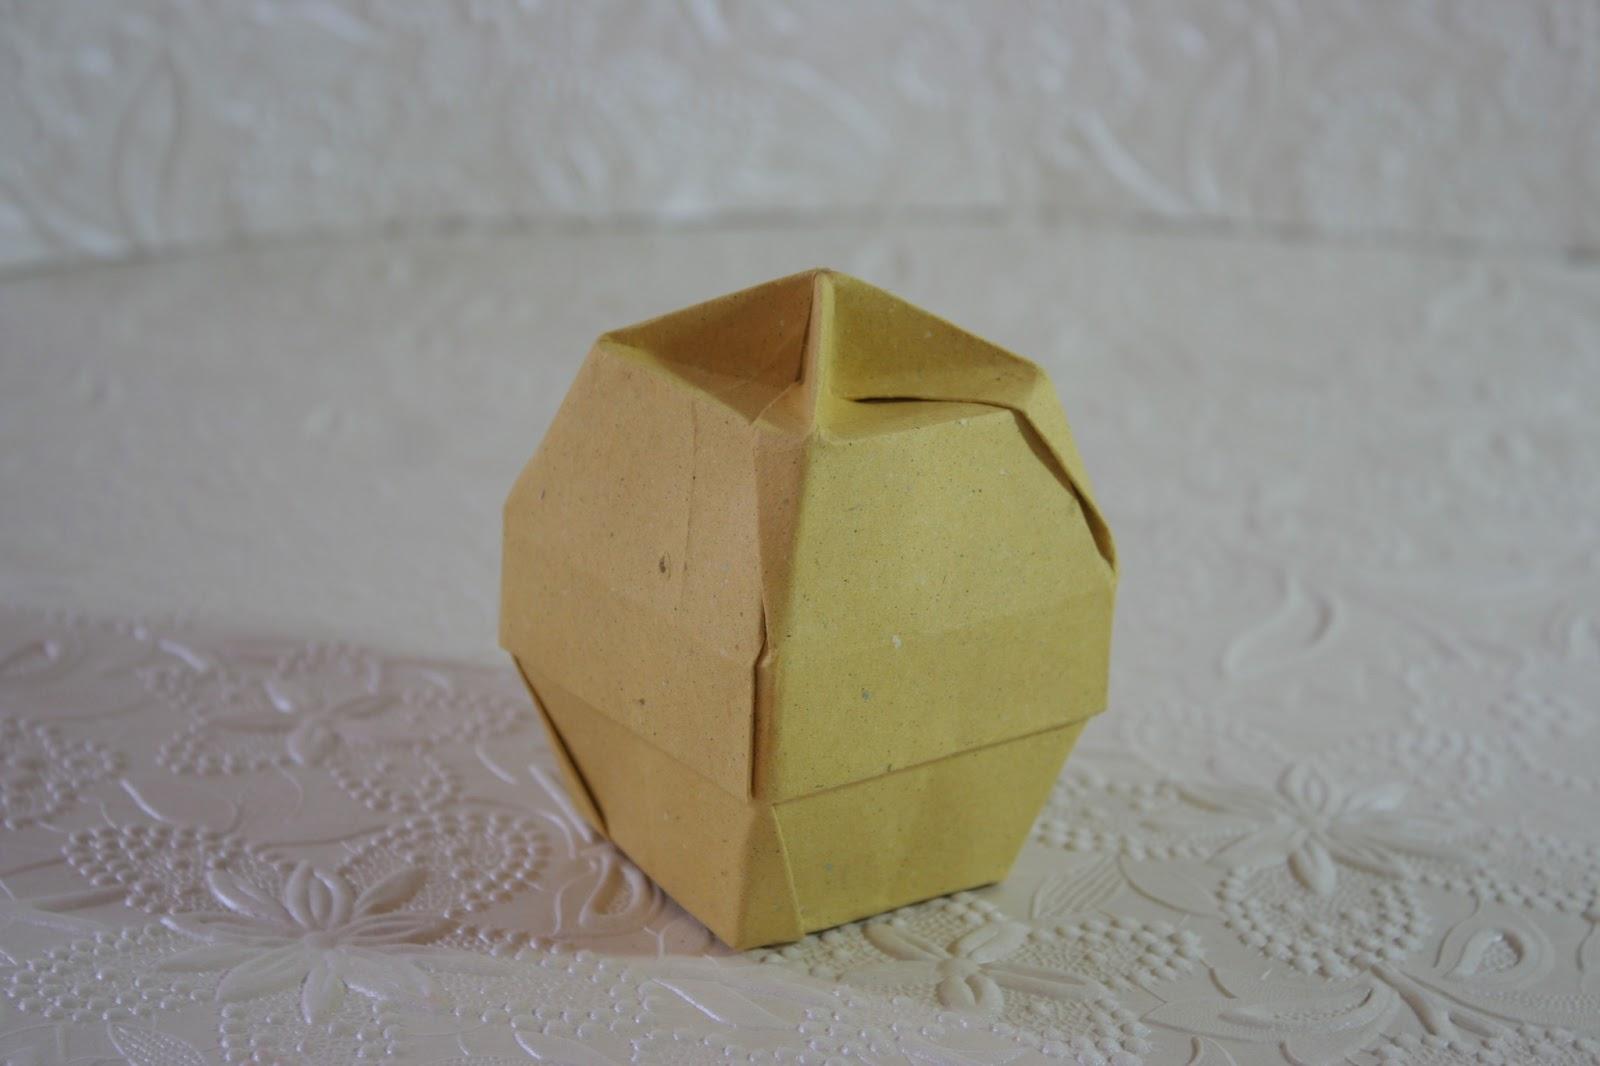 Origami Chinese Lantern Box Constructions Tomoko Fuse Hexagon Instructions